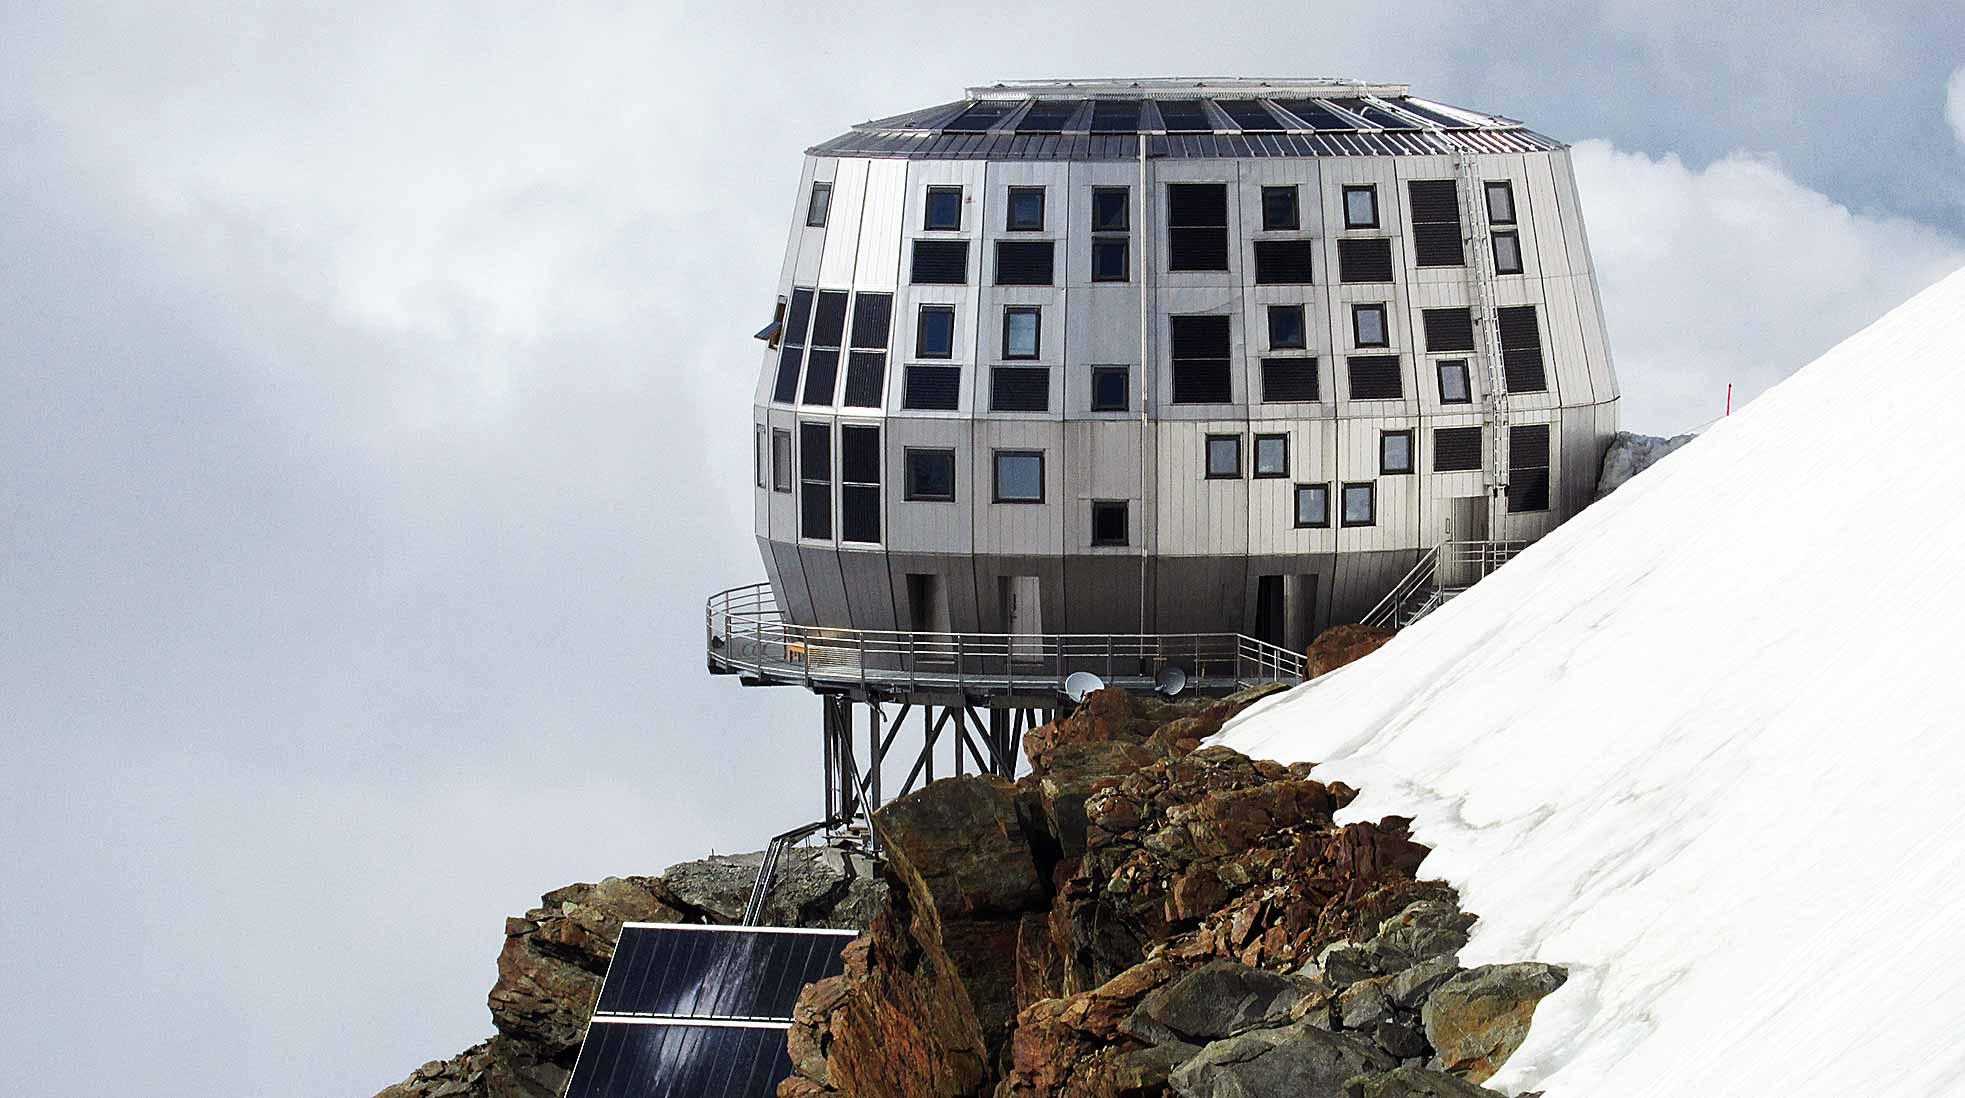 Refuge du Goûter, Mont Blanc, Frankrike. Foto: Coronium via Wikimedia Commons (CC BY-SA 3.0)